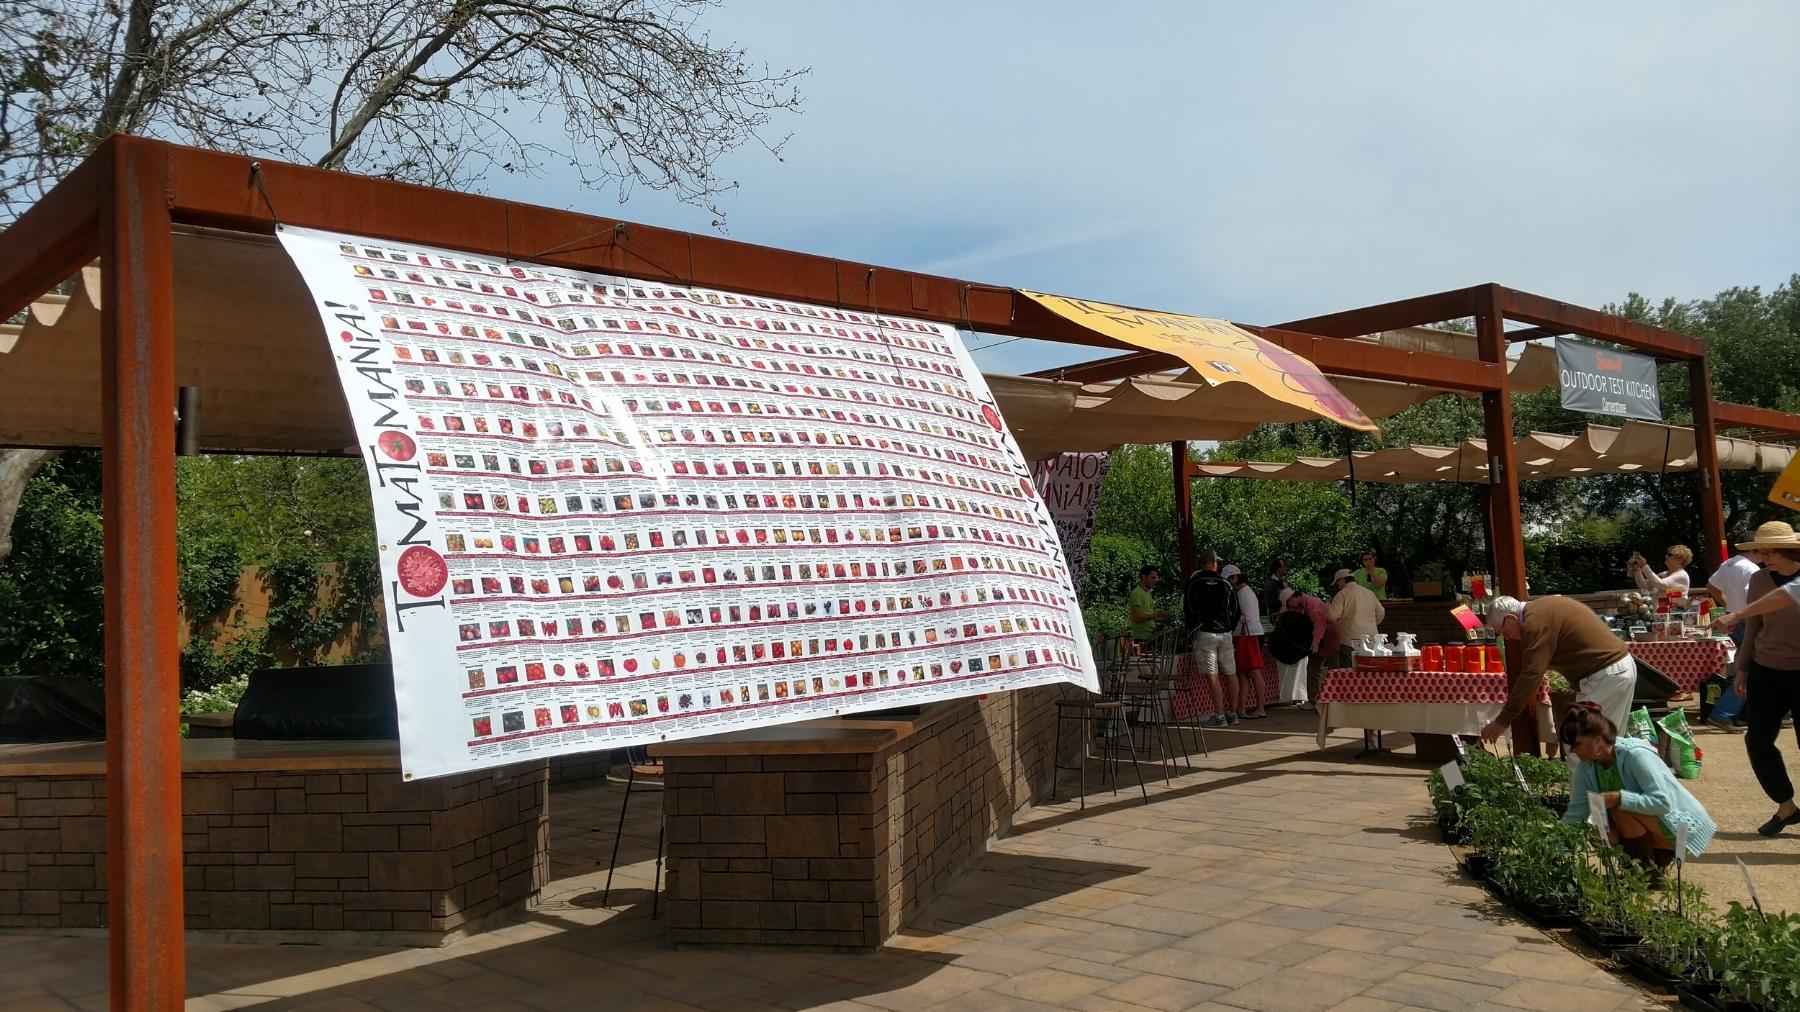 Tomatomania.2017.Banner.462.Tomatoes